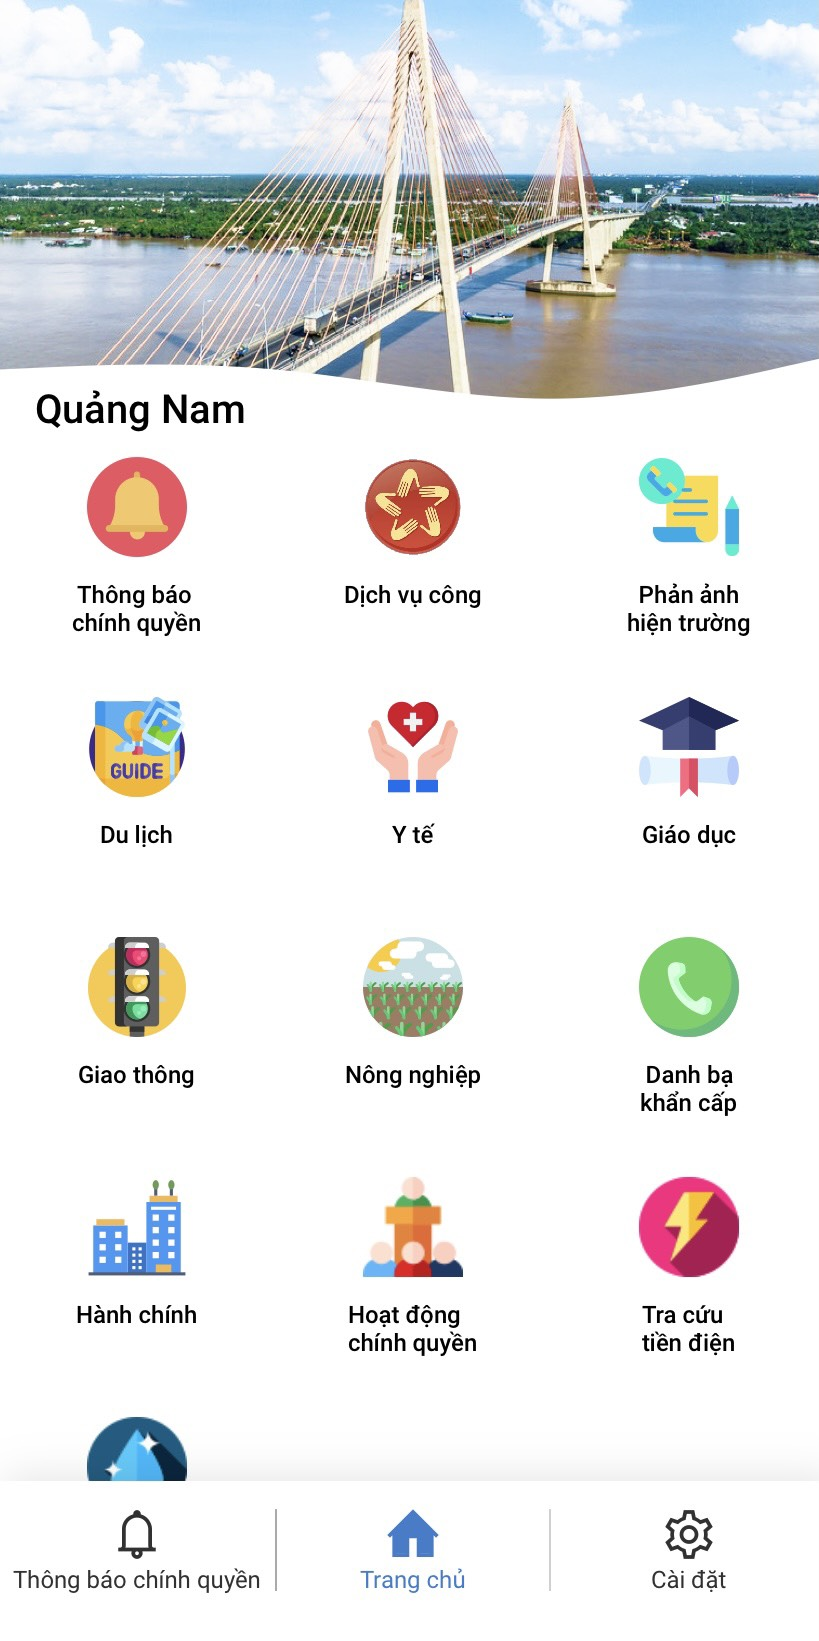 https://dientungaynay.vn/sites/default/files/hanhnd/anh_bai_viet/smart-quang-nam-quang-nam-thong-minh-phuc-vu-nguoi-dan-1618464846.jpg